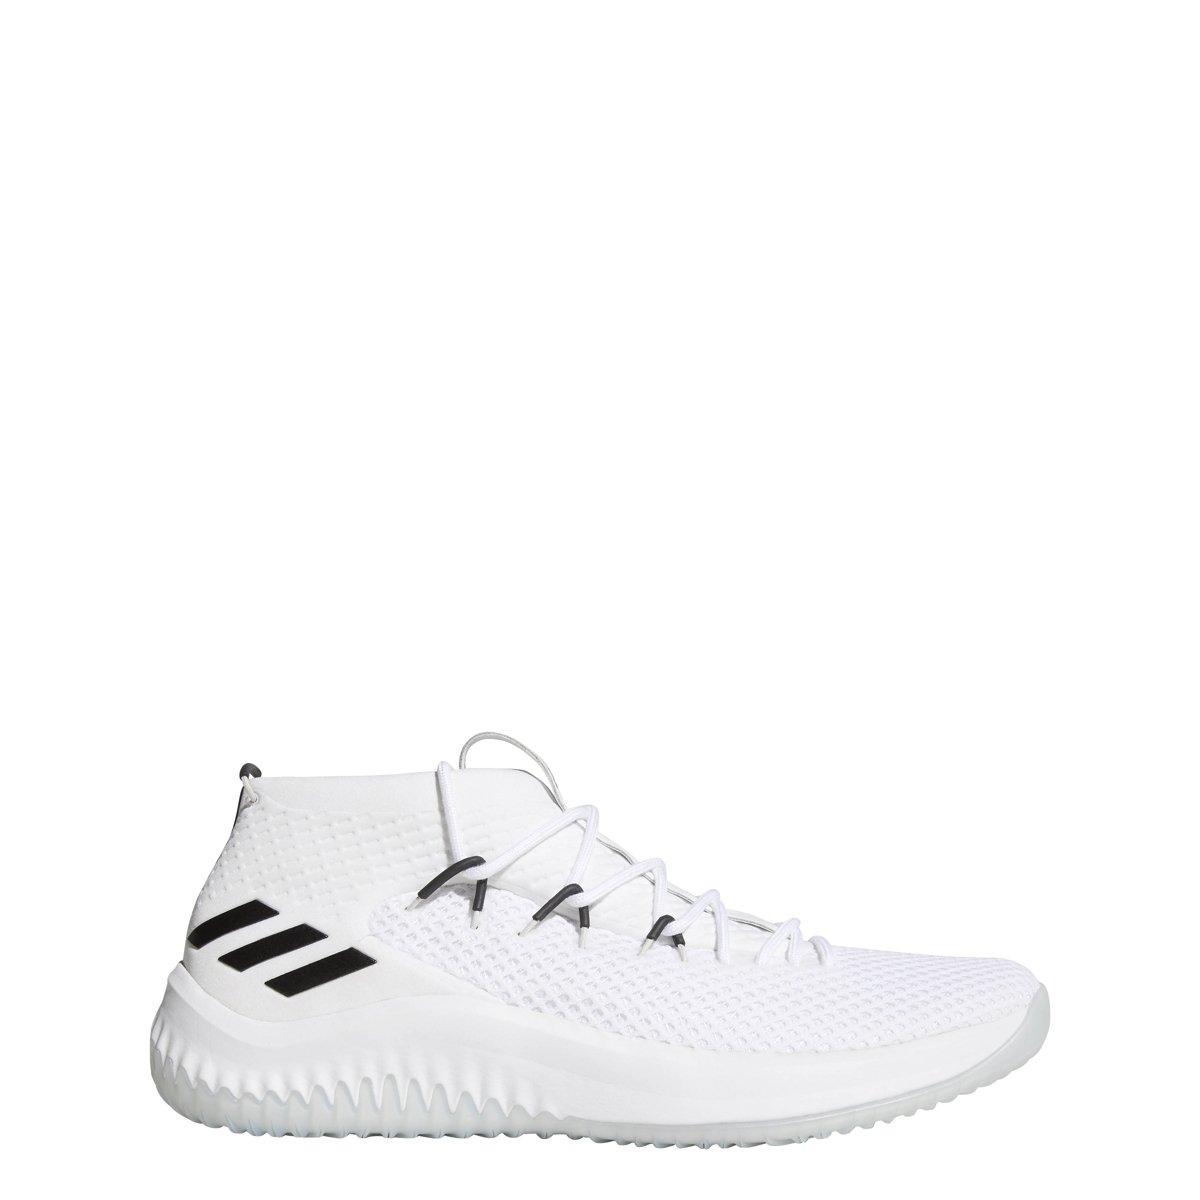 4037d6b40f1d Galleon - Adidas Men s Dame 4 Basketball Shoes White Black Size 9 M US